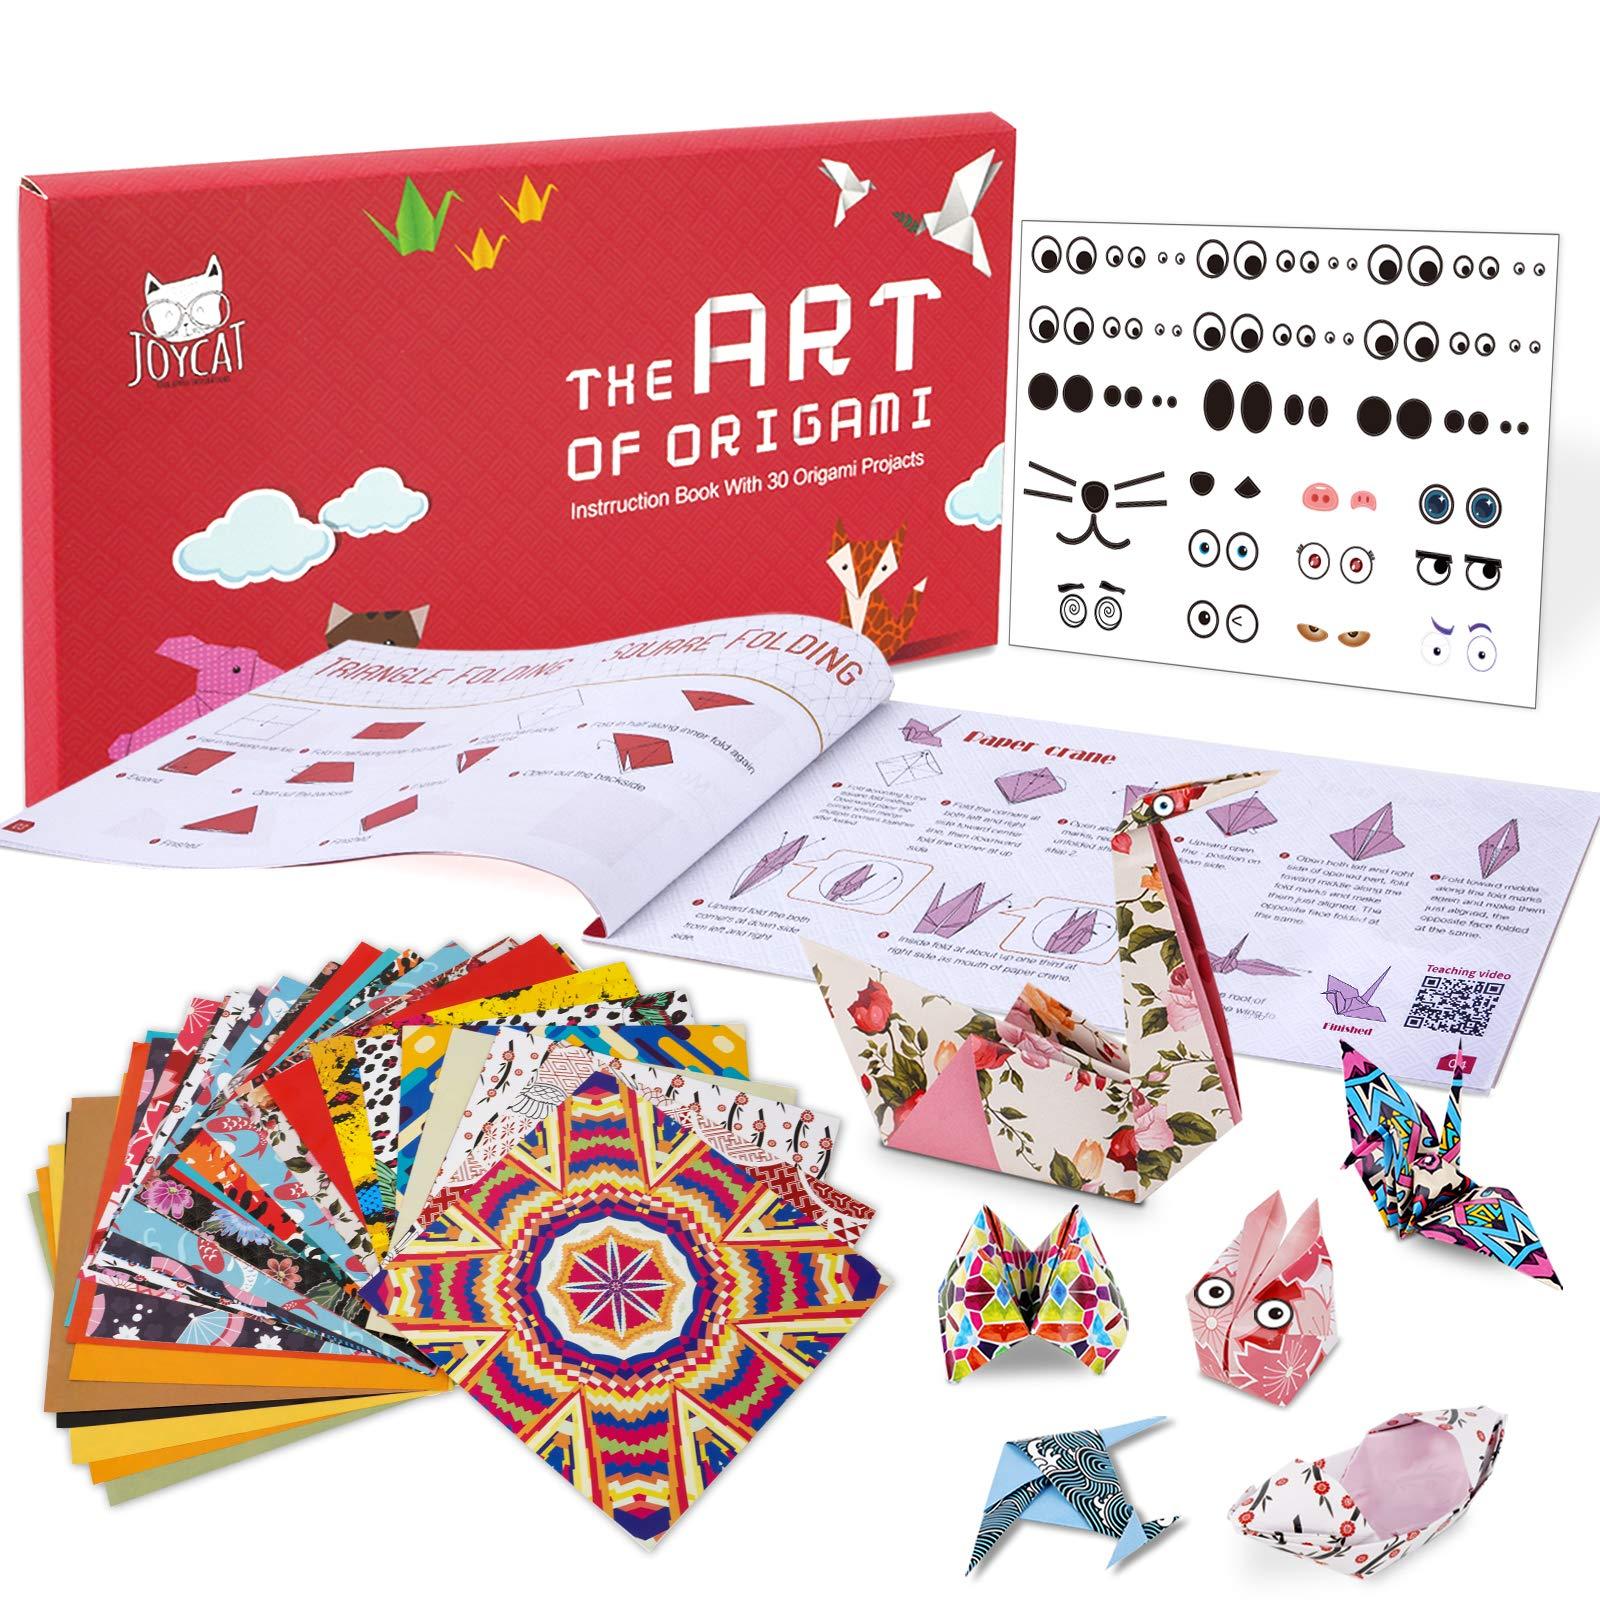 JoyCat Origami Paper Kit90 Sheets Double Sided Origami PaperKaleidoscopeJapanese and Animal Patterns30